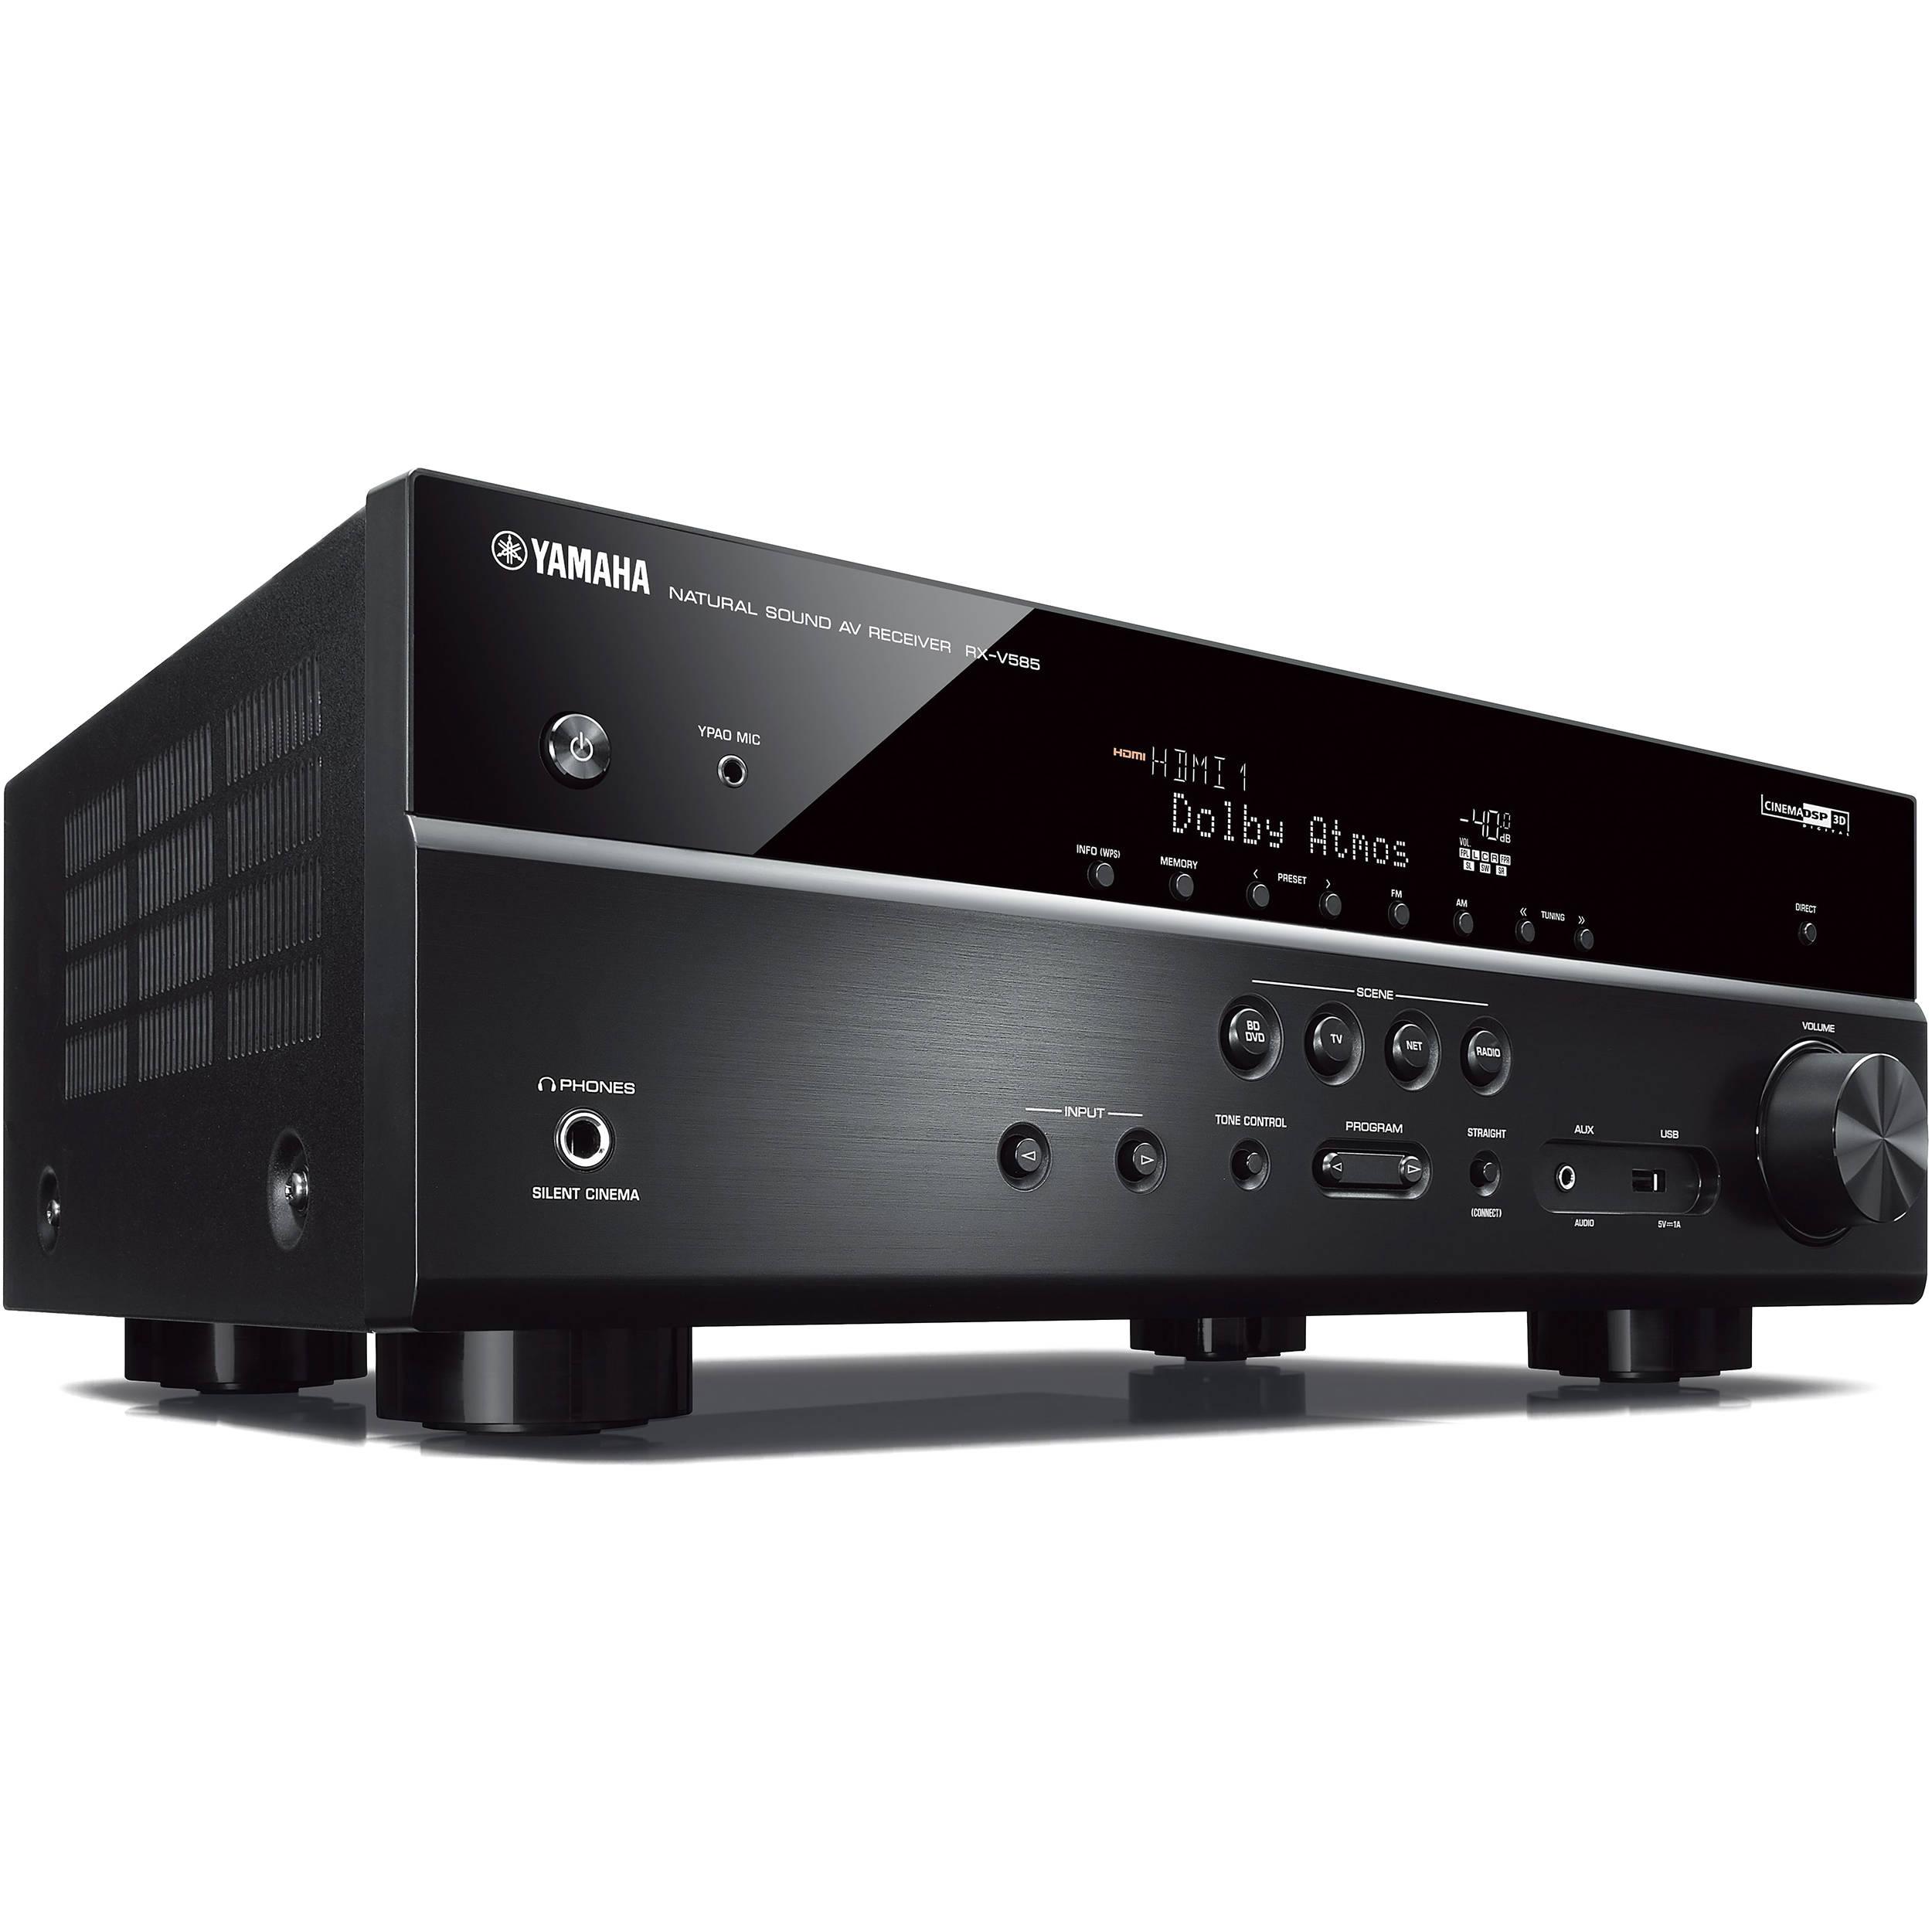 Yamaha RX-V585 7 2-Channel MusicCast A/V Receiver